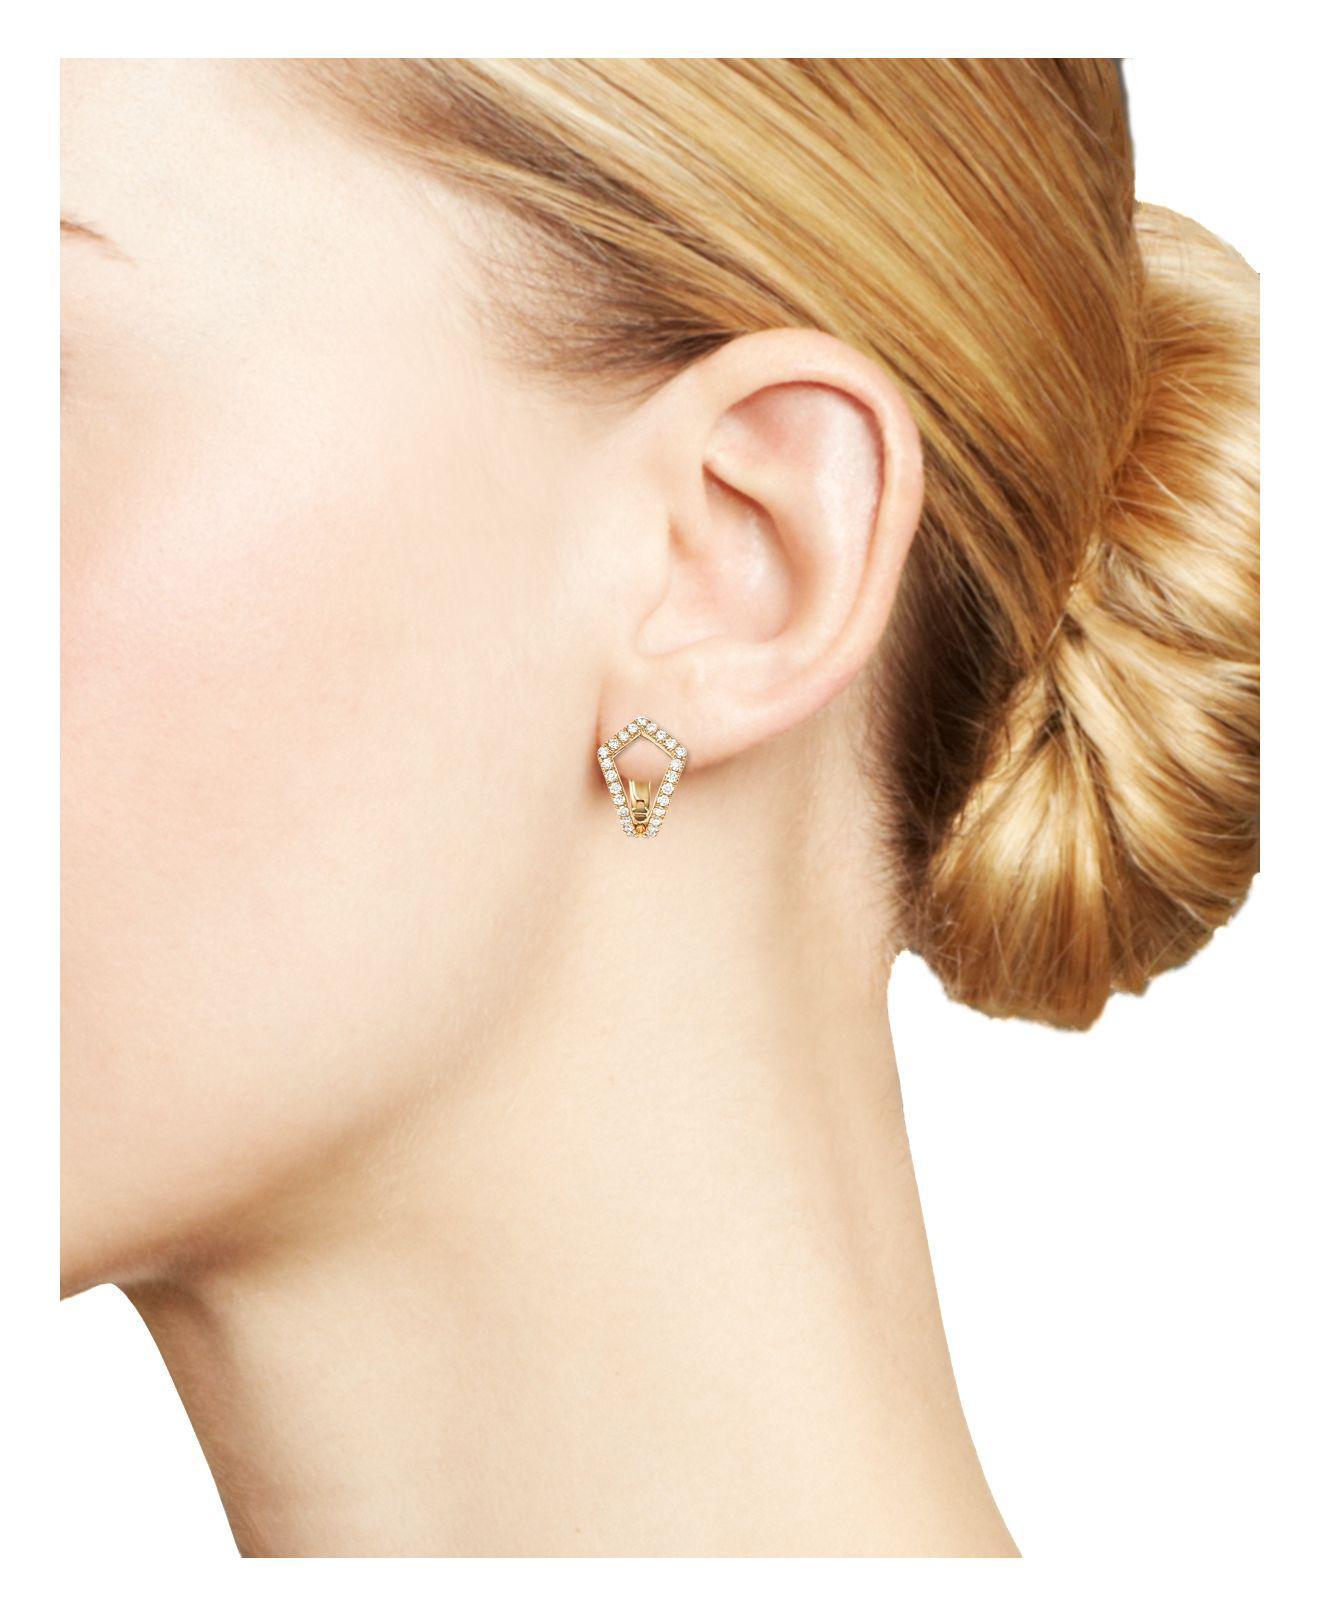 Dana rebecca Sarah Leah Diamond Huggie Earrings in Metallic